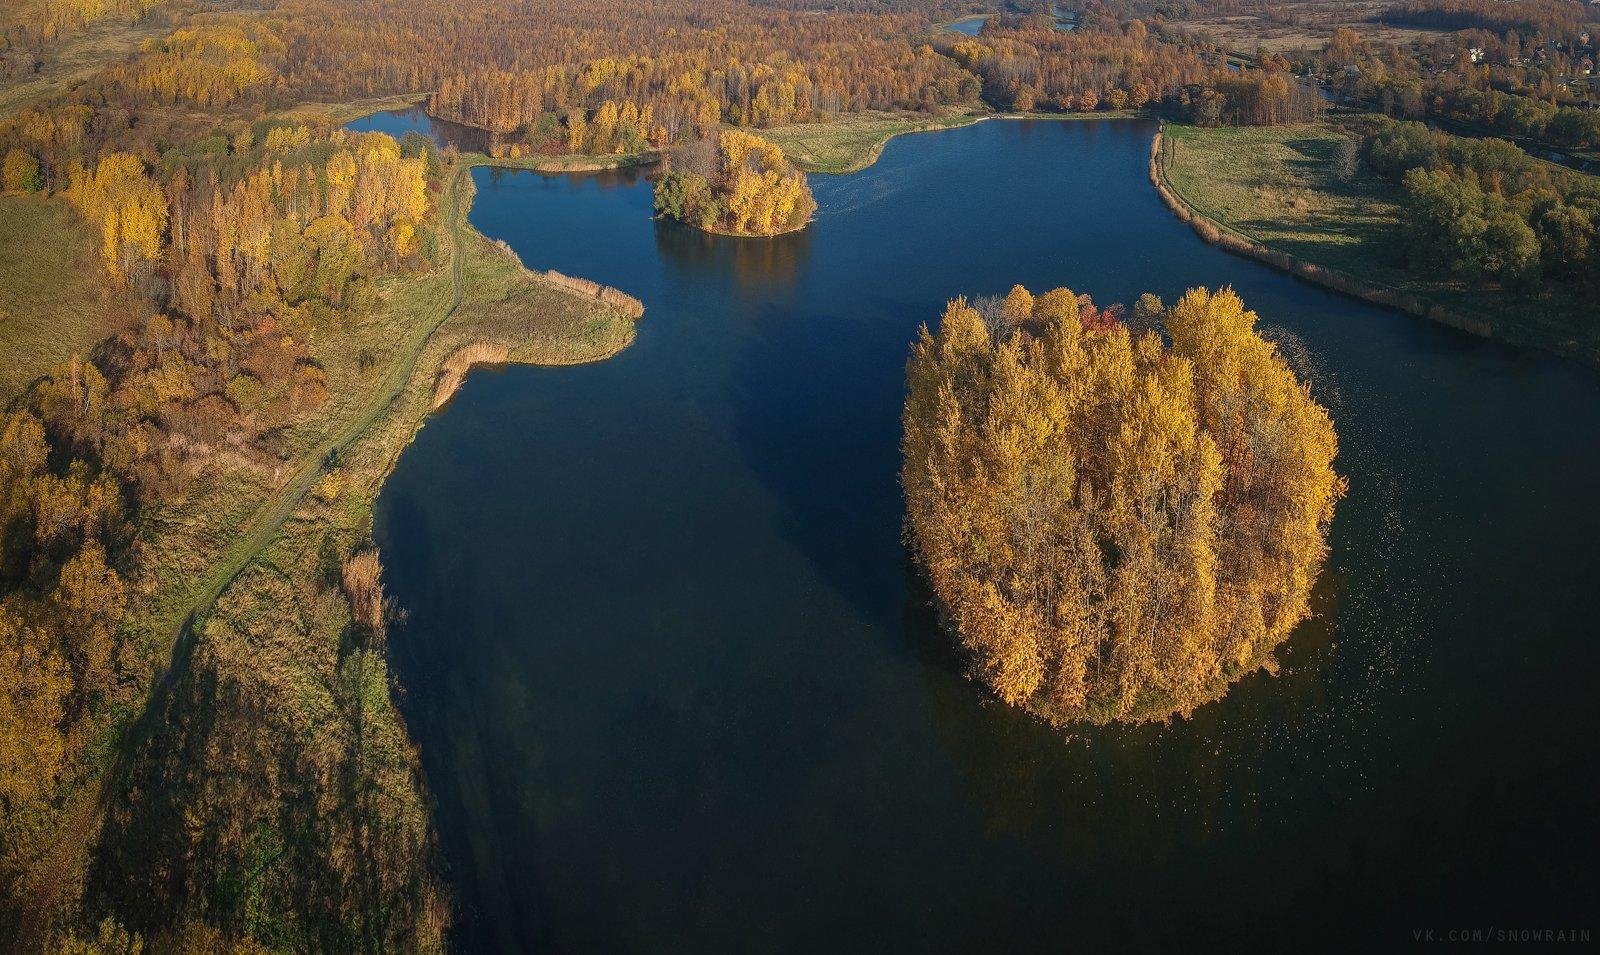 autumn, nature, aerial, drone, аэрофотосъемка, коптер, природа, пейзаж, landscape, осень, djispark, Snowrain